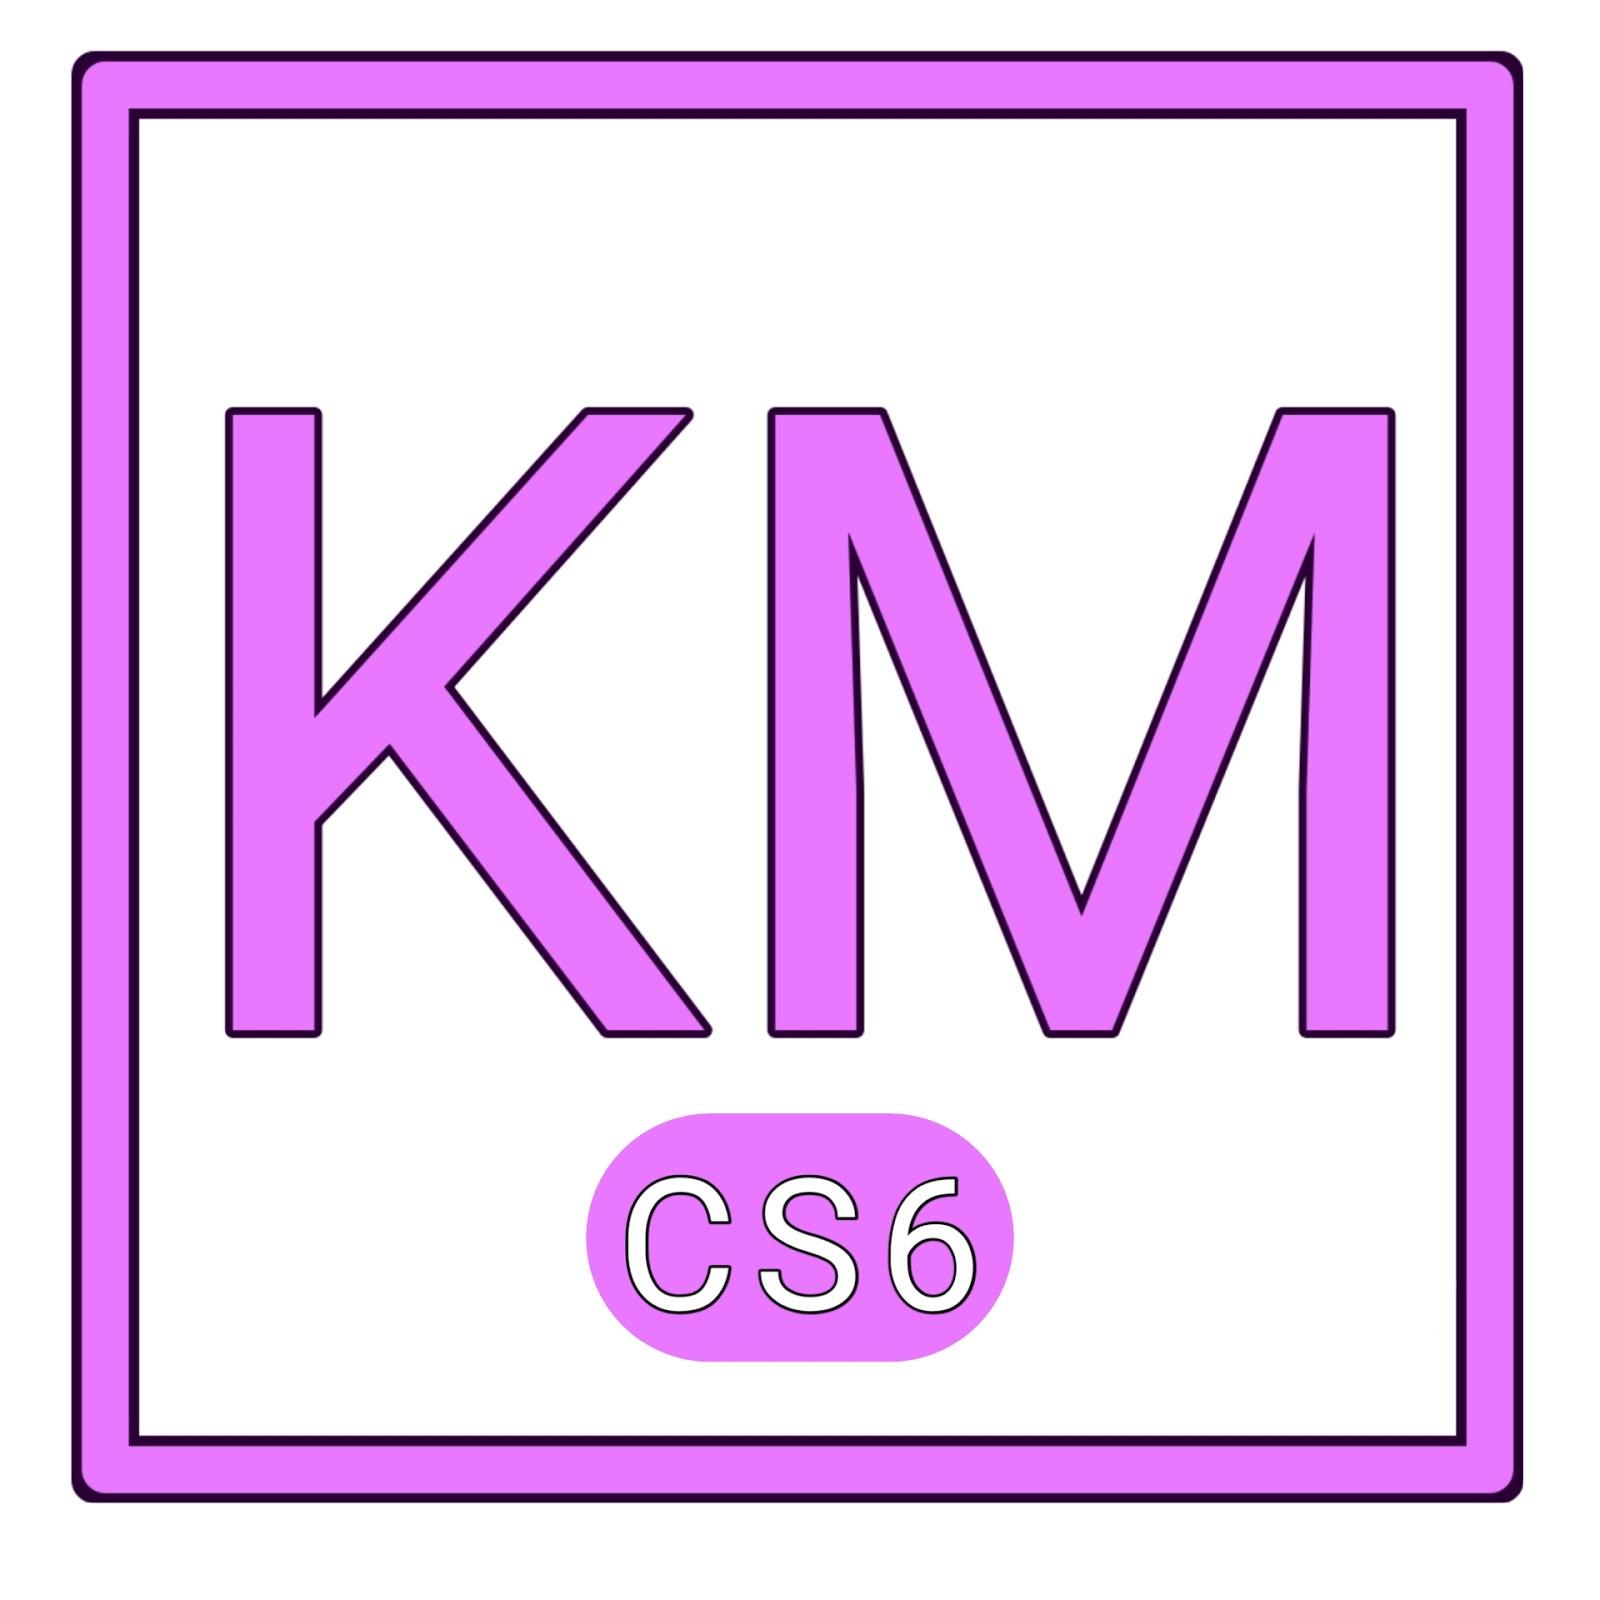 Km Premiere Pro Cs6 Support Reverse Kinemaster Pro Aprelryu Aprelryu Blog